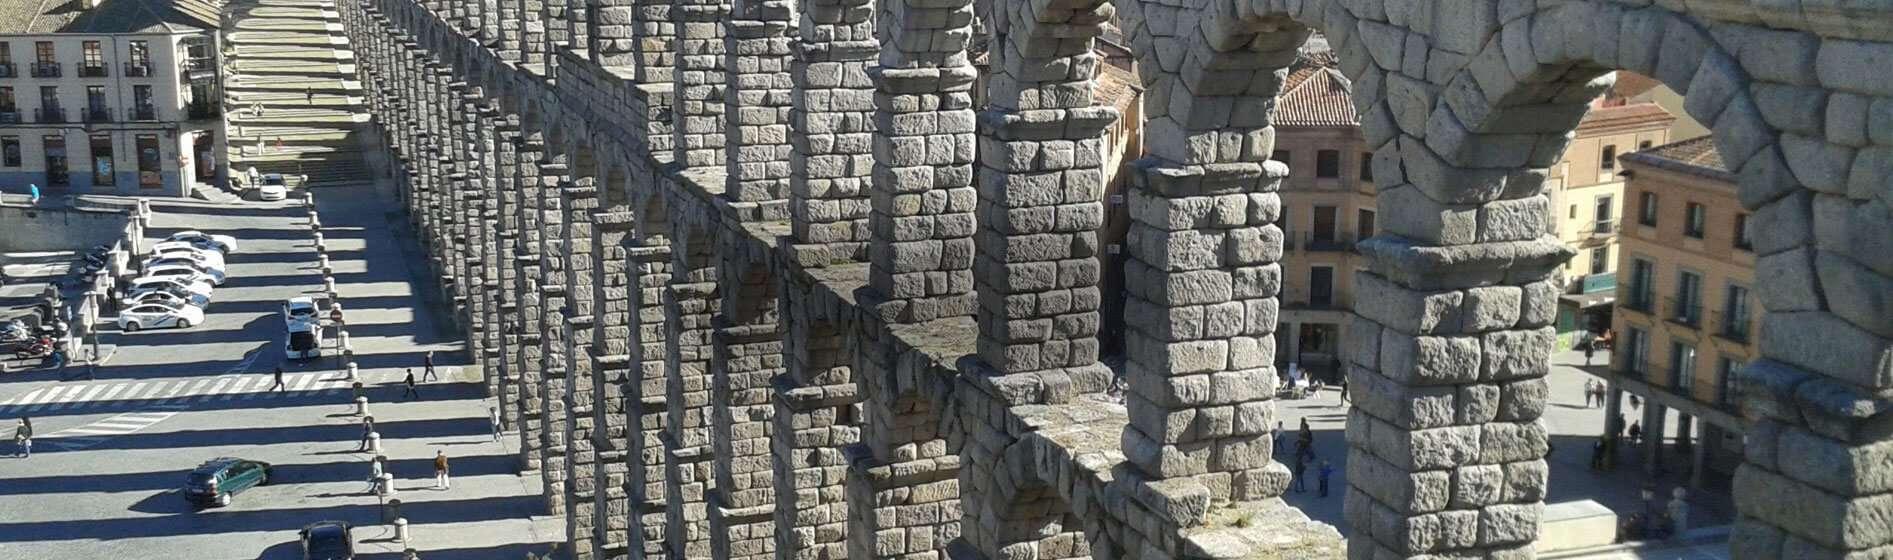 Segovia-madrid-tours